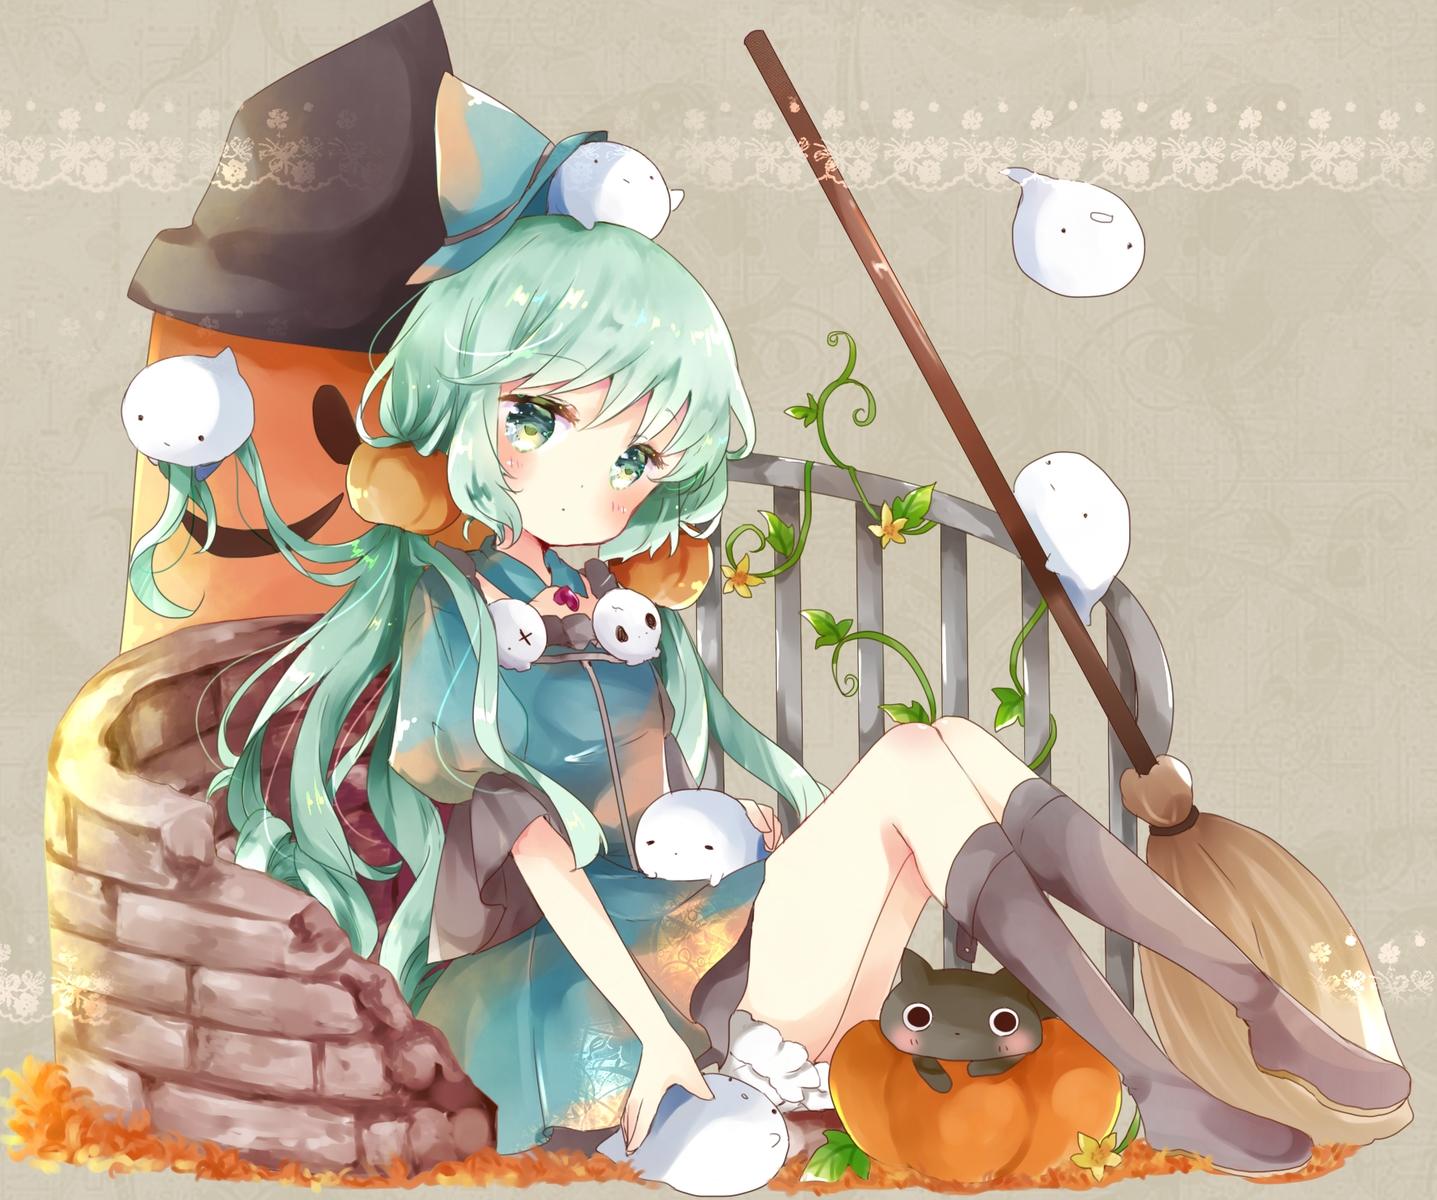 animal aqua aqua_eyes aqua_hair bloomers boots cat dress flowers halloween hat original pumpkin tsukiyo_(skymint) witch witch_hat